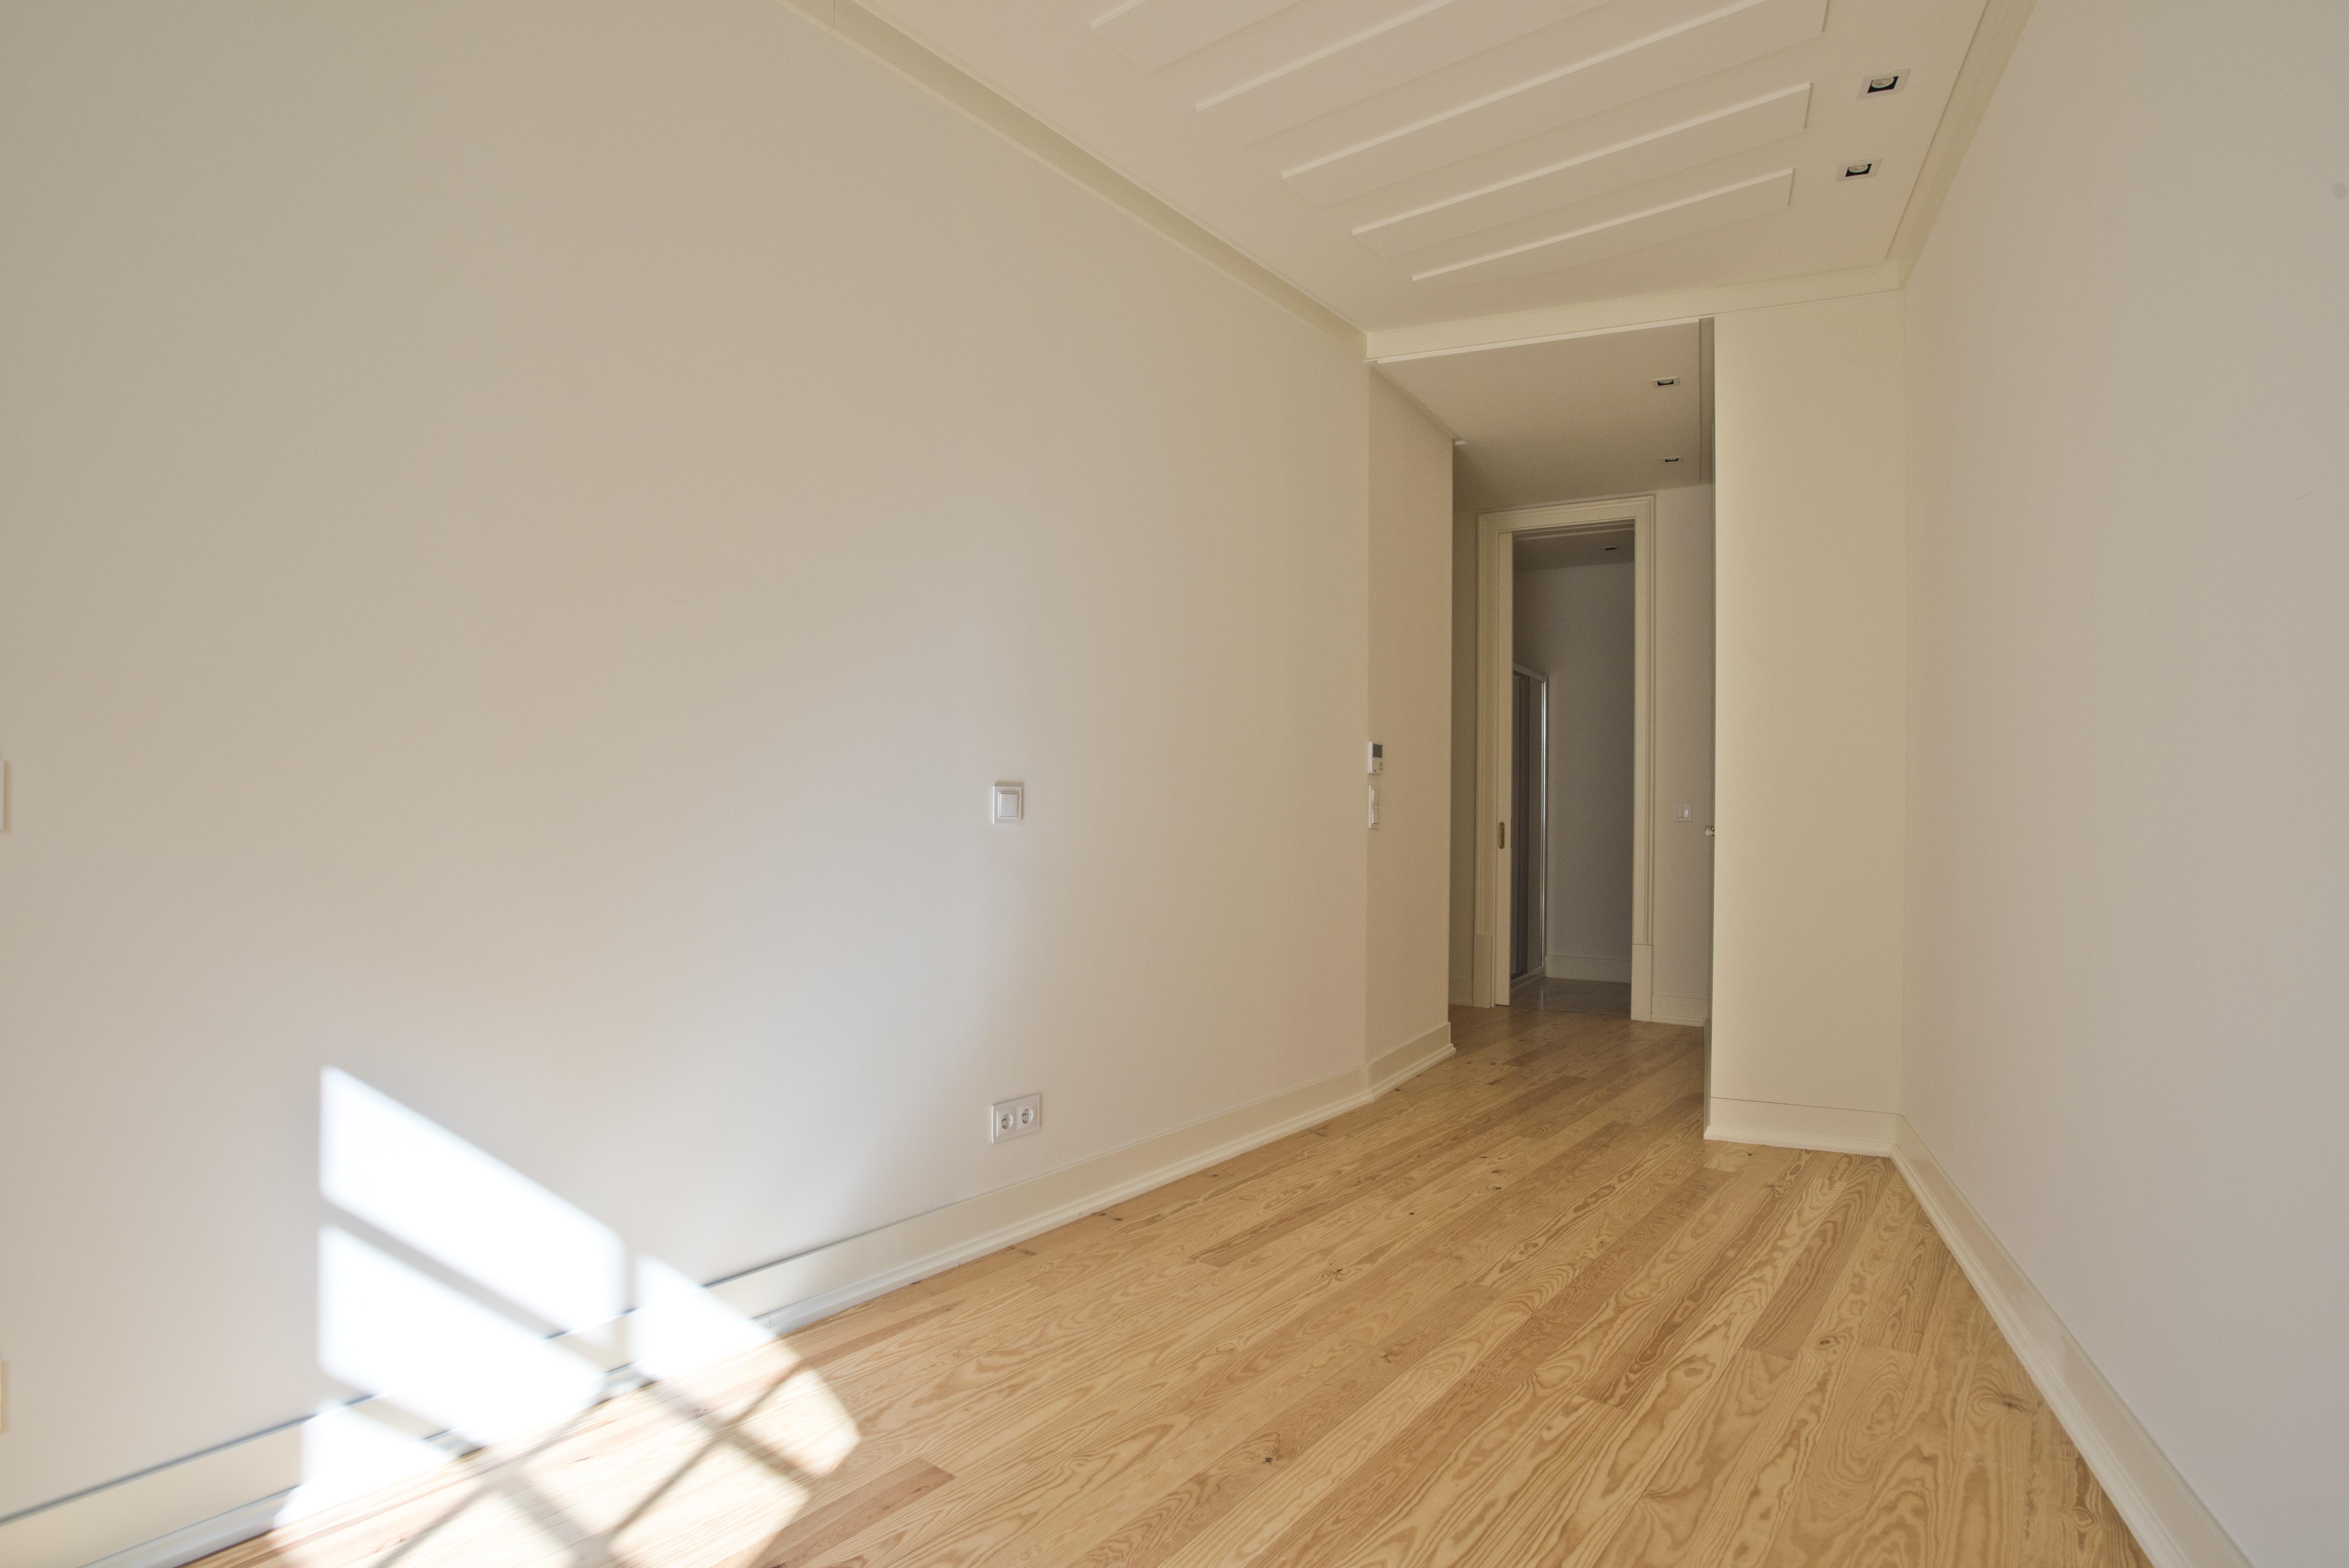 renaissance-chiado-apartments-38